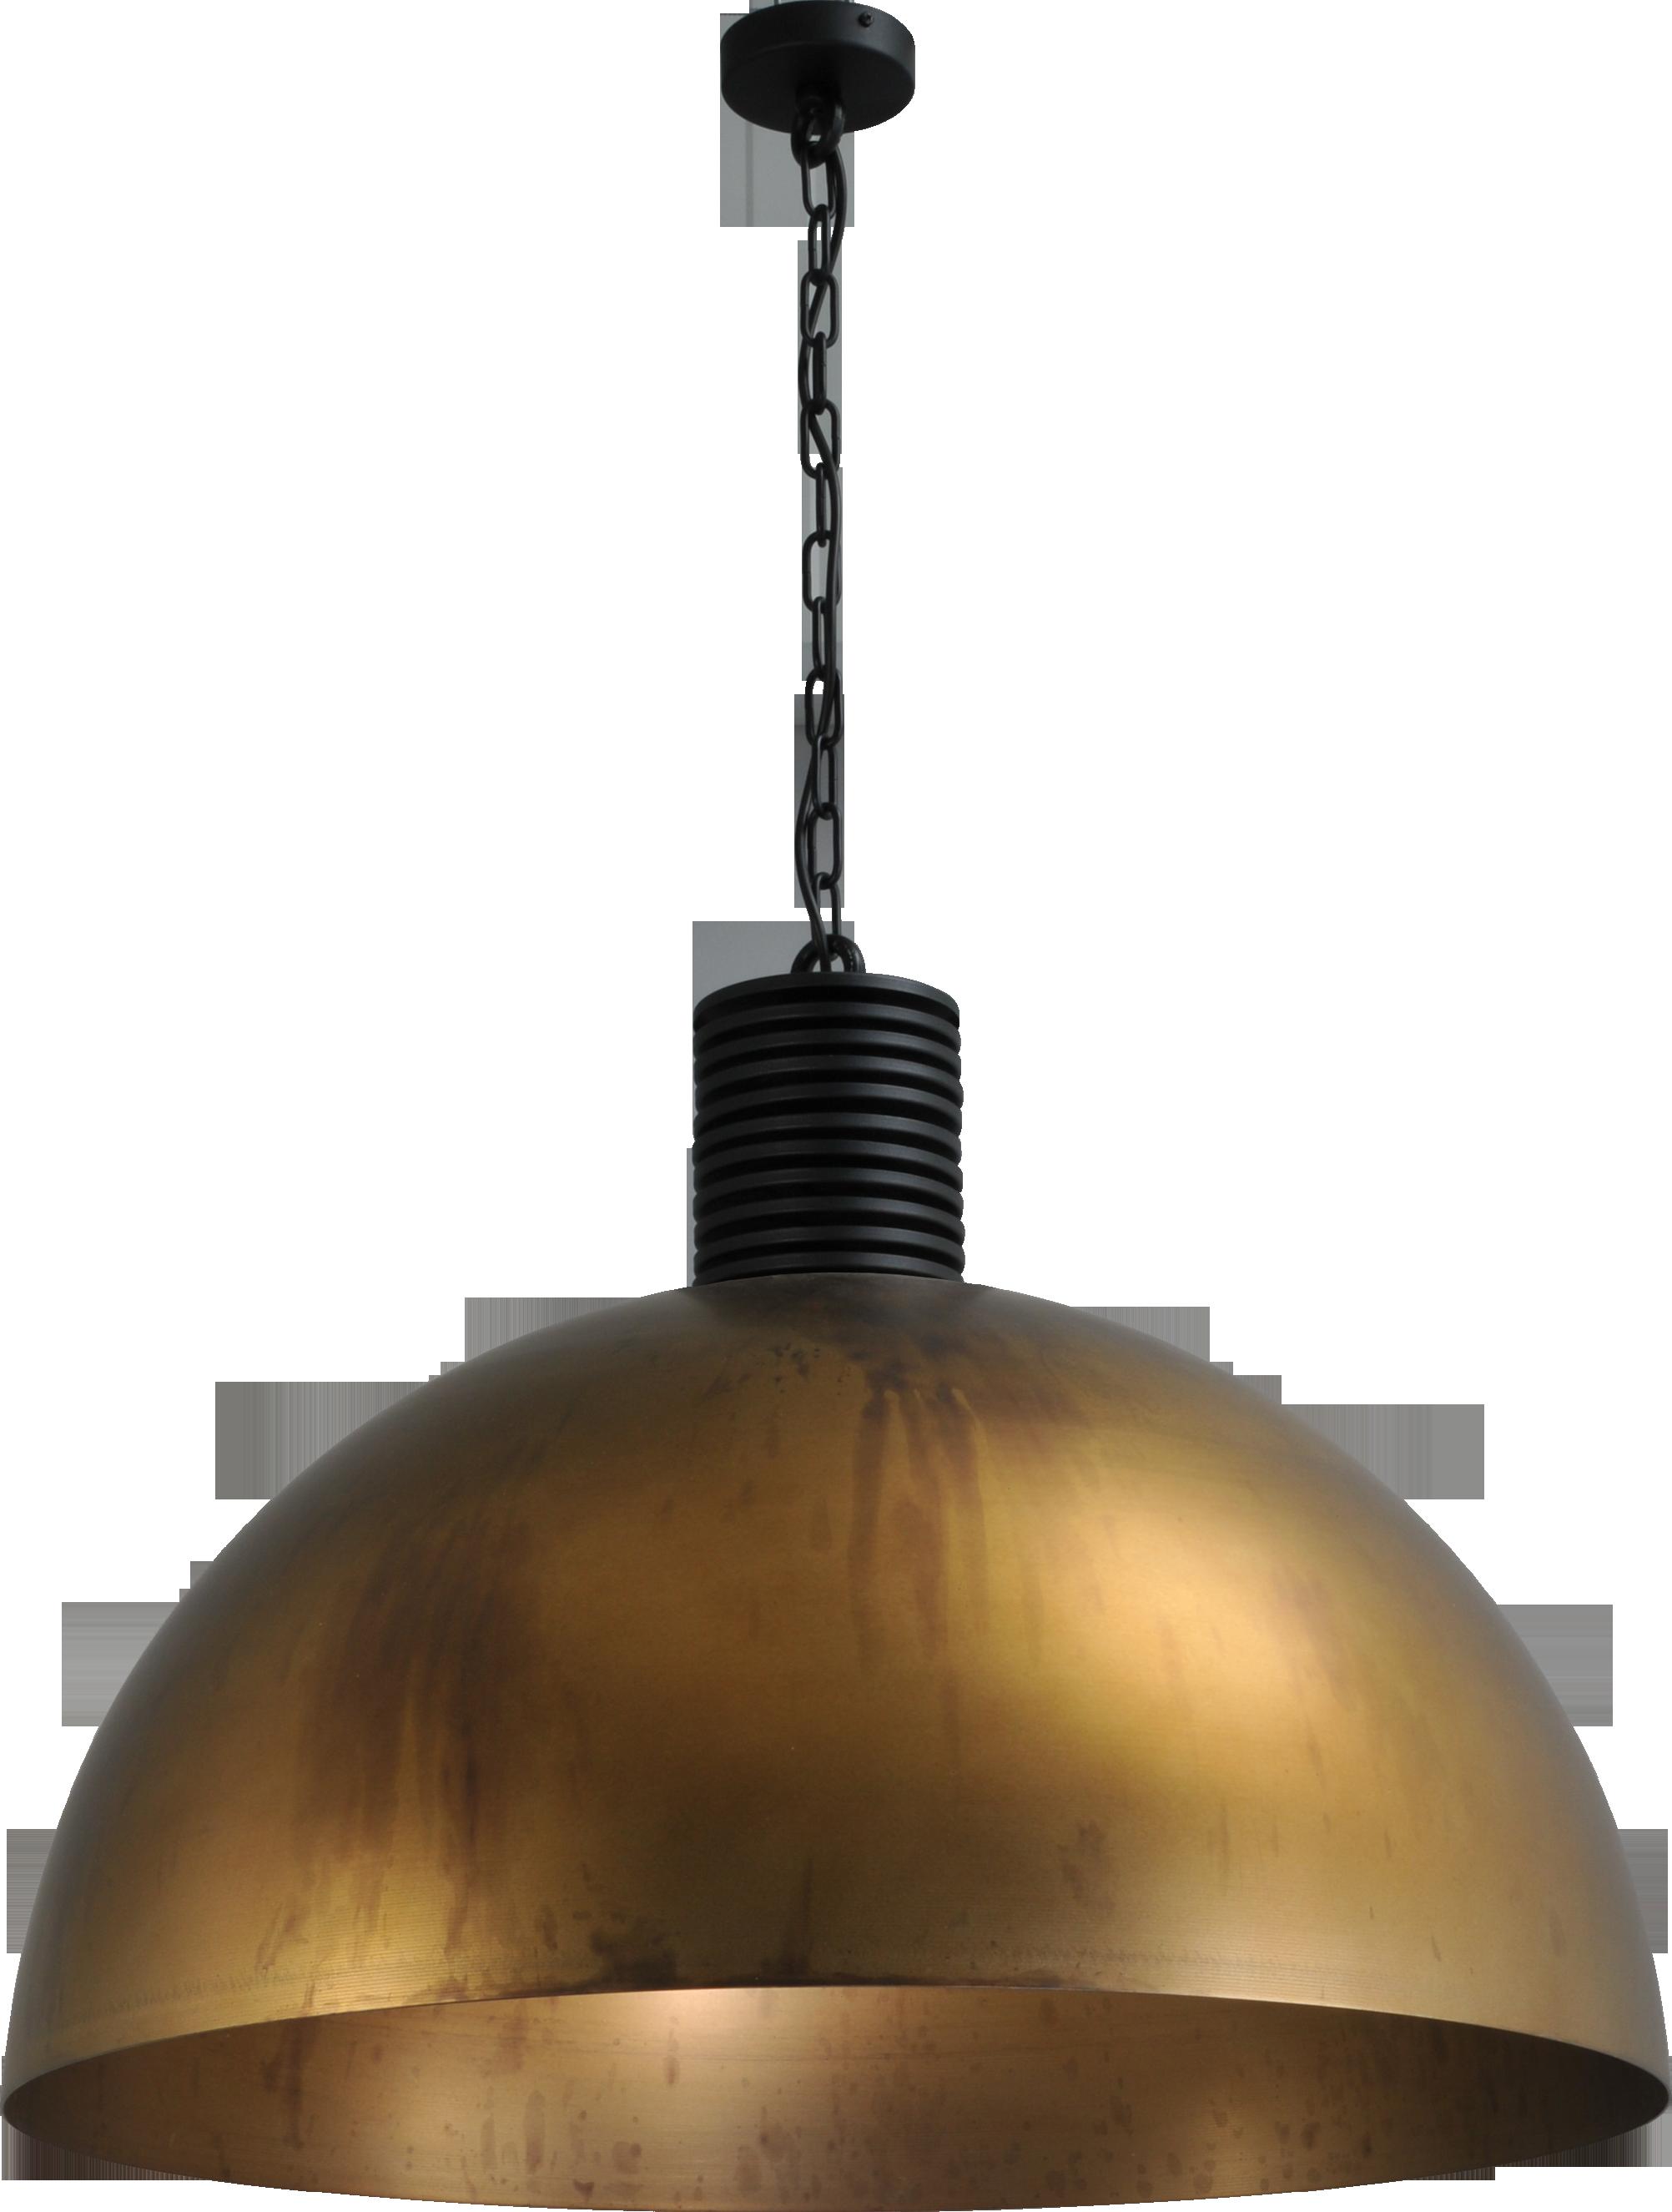 Larino Antique Brass HL LARINO Ø80CM ANTIQUE BRASS OUTSIDE